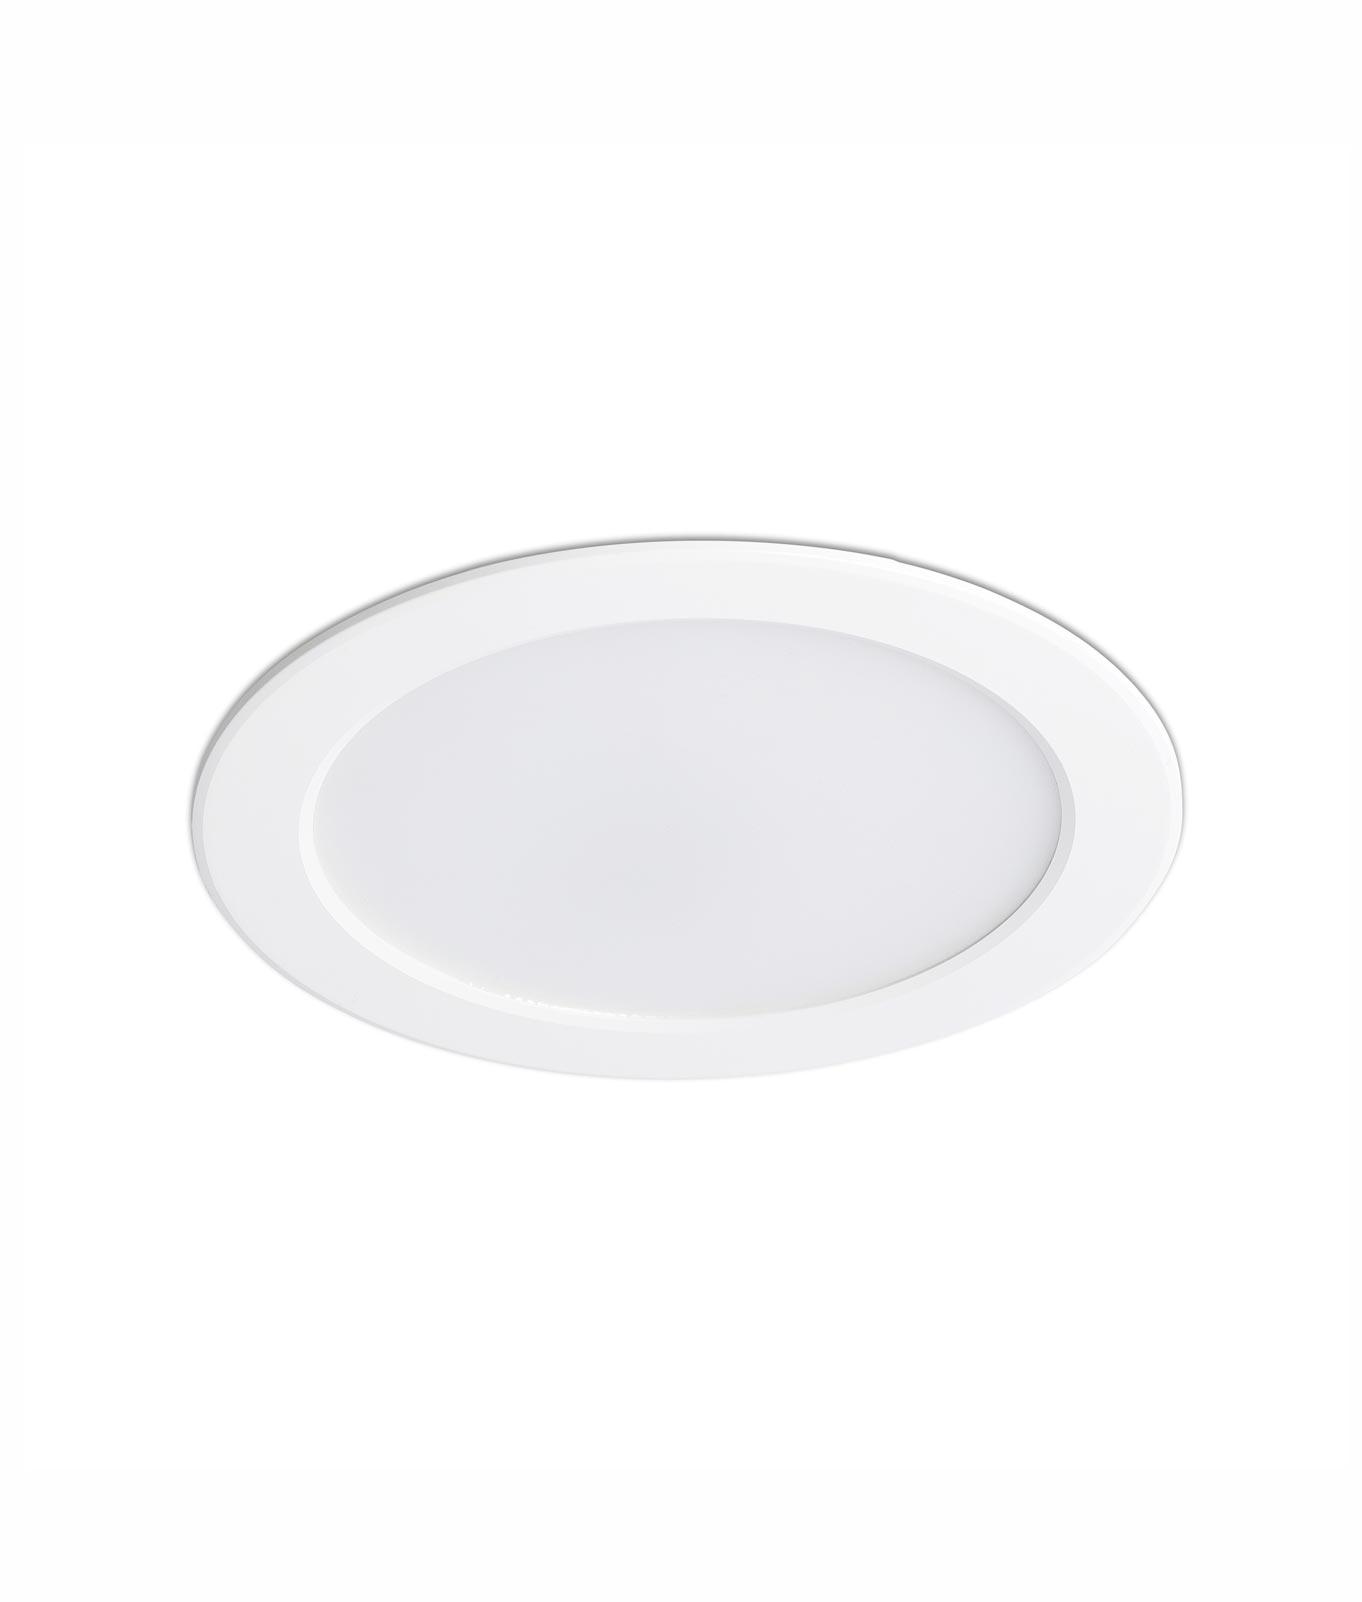 Lámpara empotrable LED TED blanca